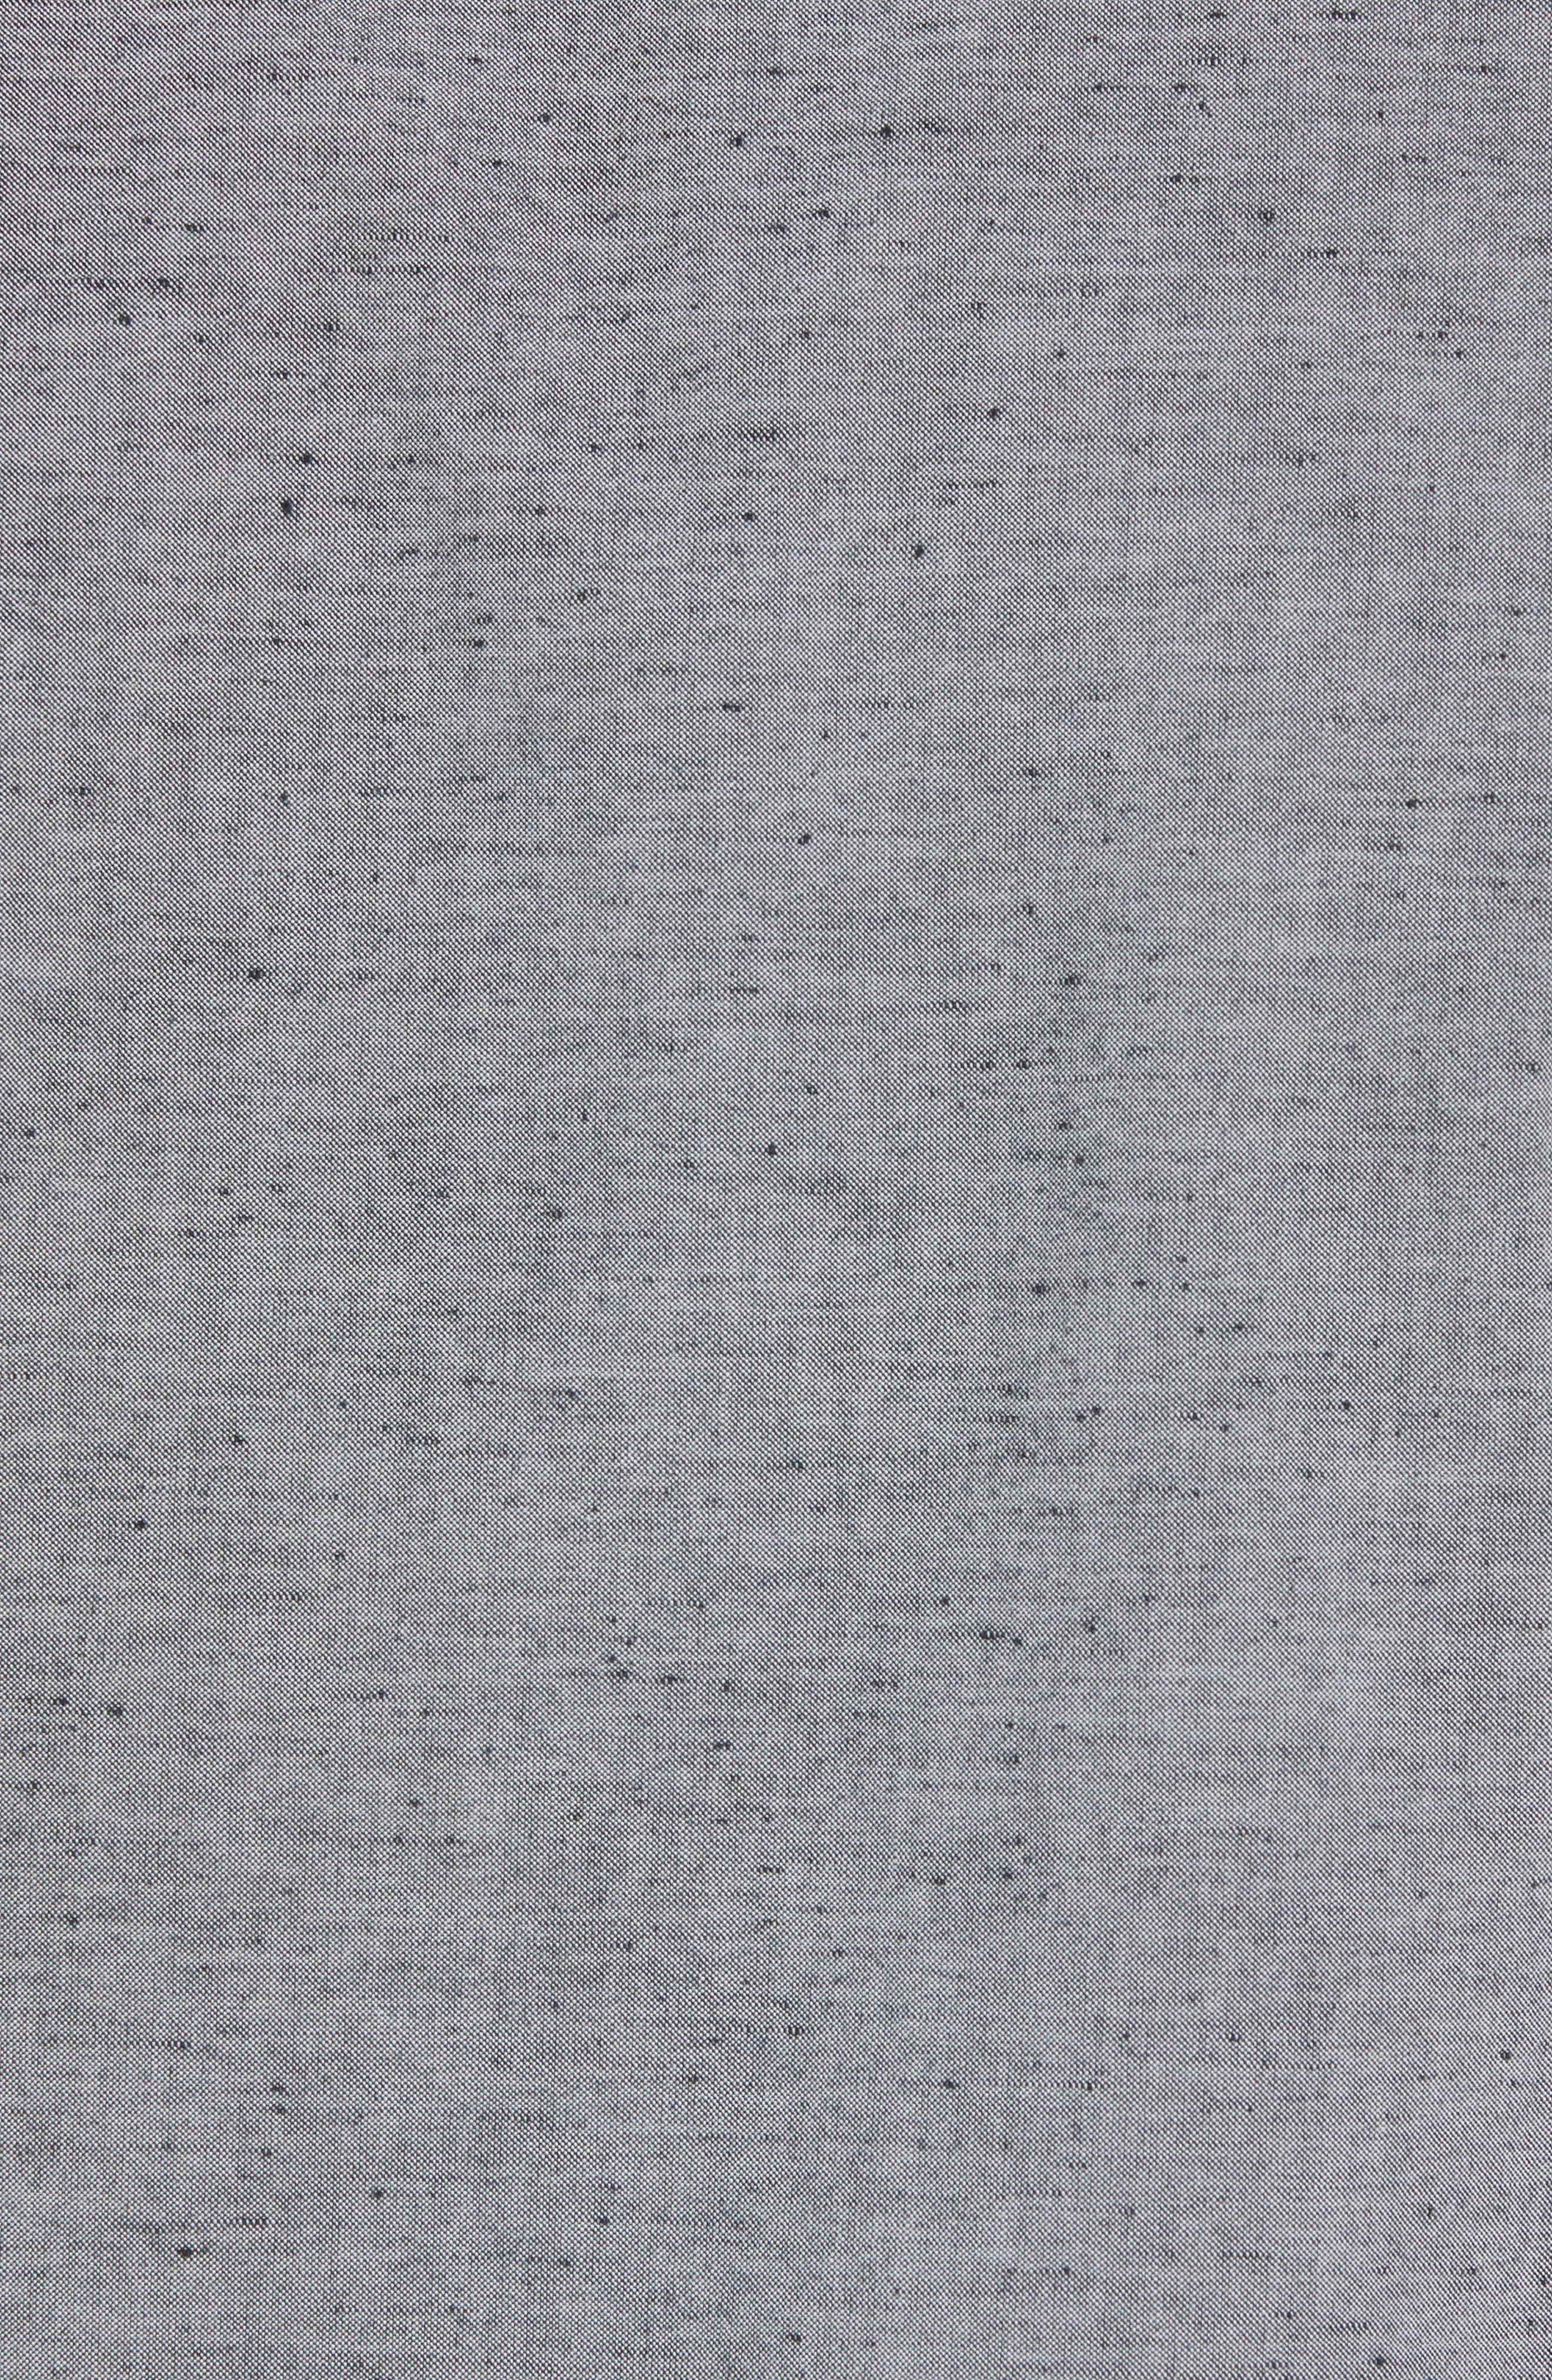 Workwear Chambray Sport Shirt,                             Alternate thumbnail 5, color,                             GREY ONYX NEP CHAMBRAY